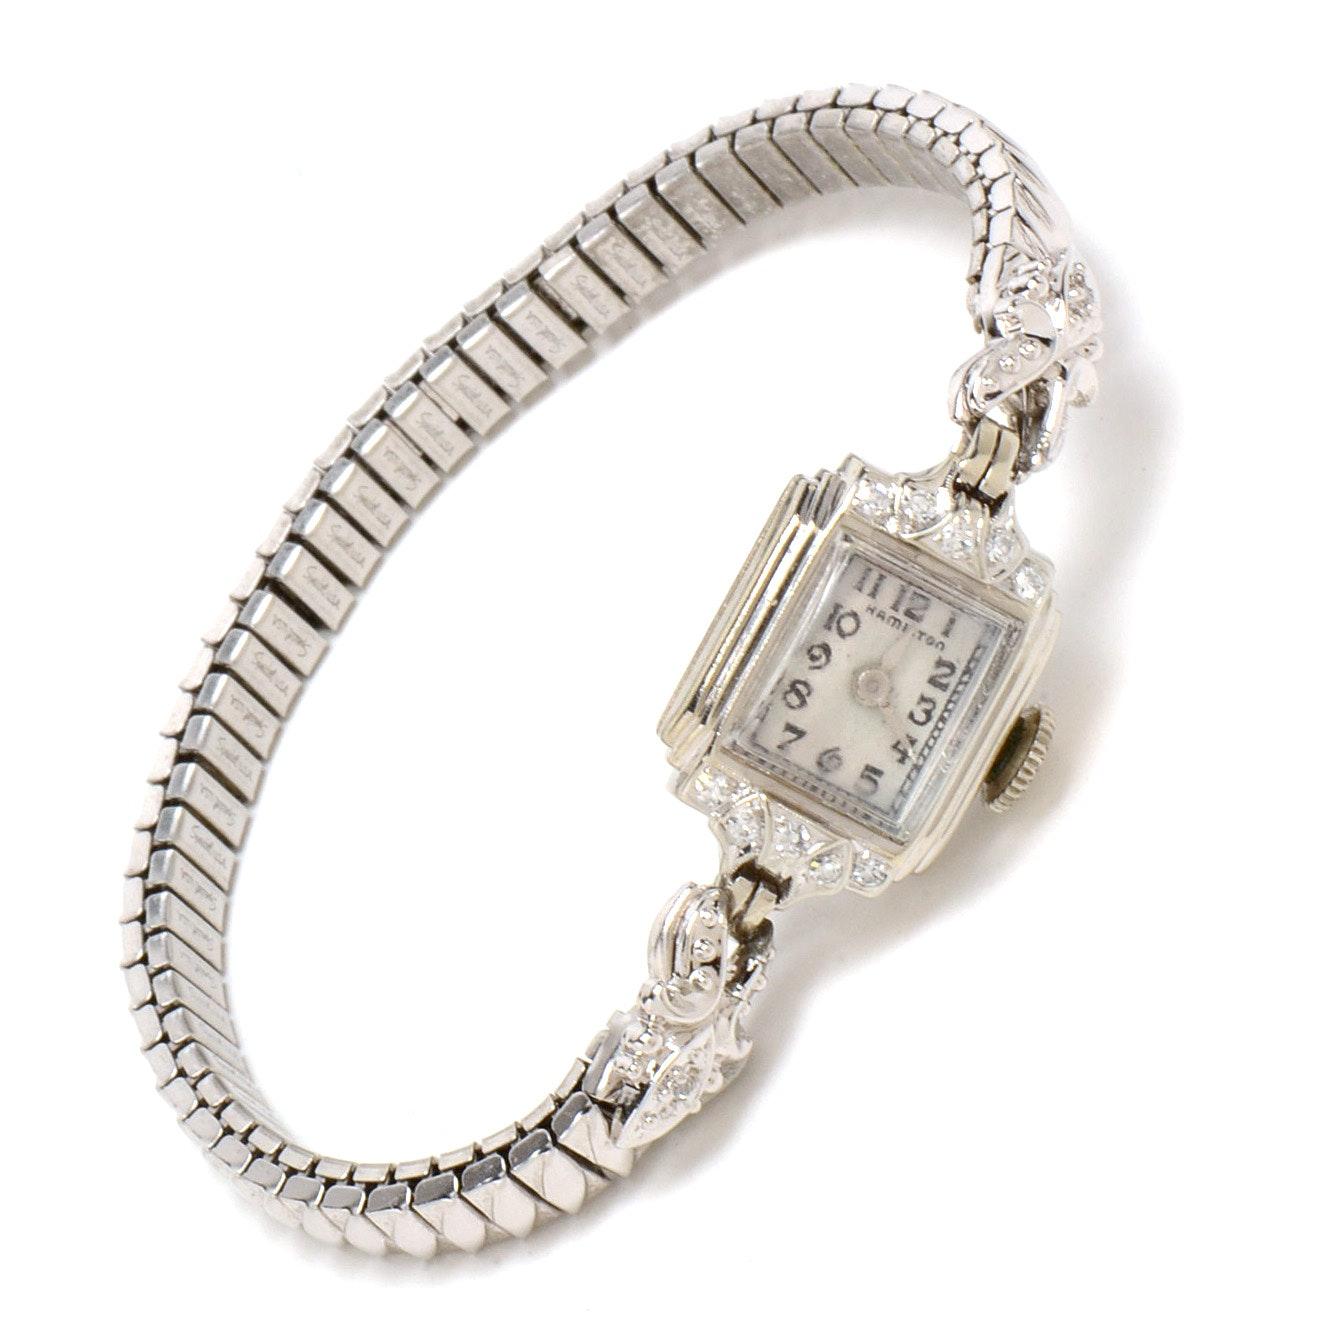 Women's Vintage 14K White Gold Diamond Wristwatch Bracelet